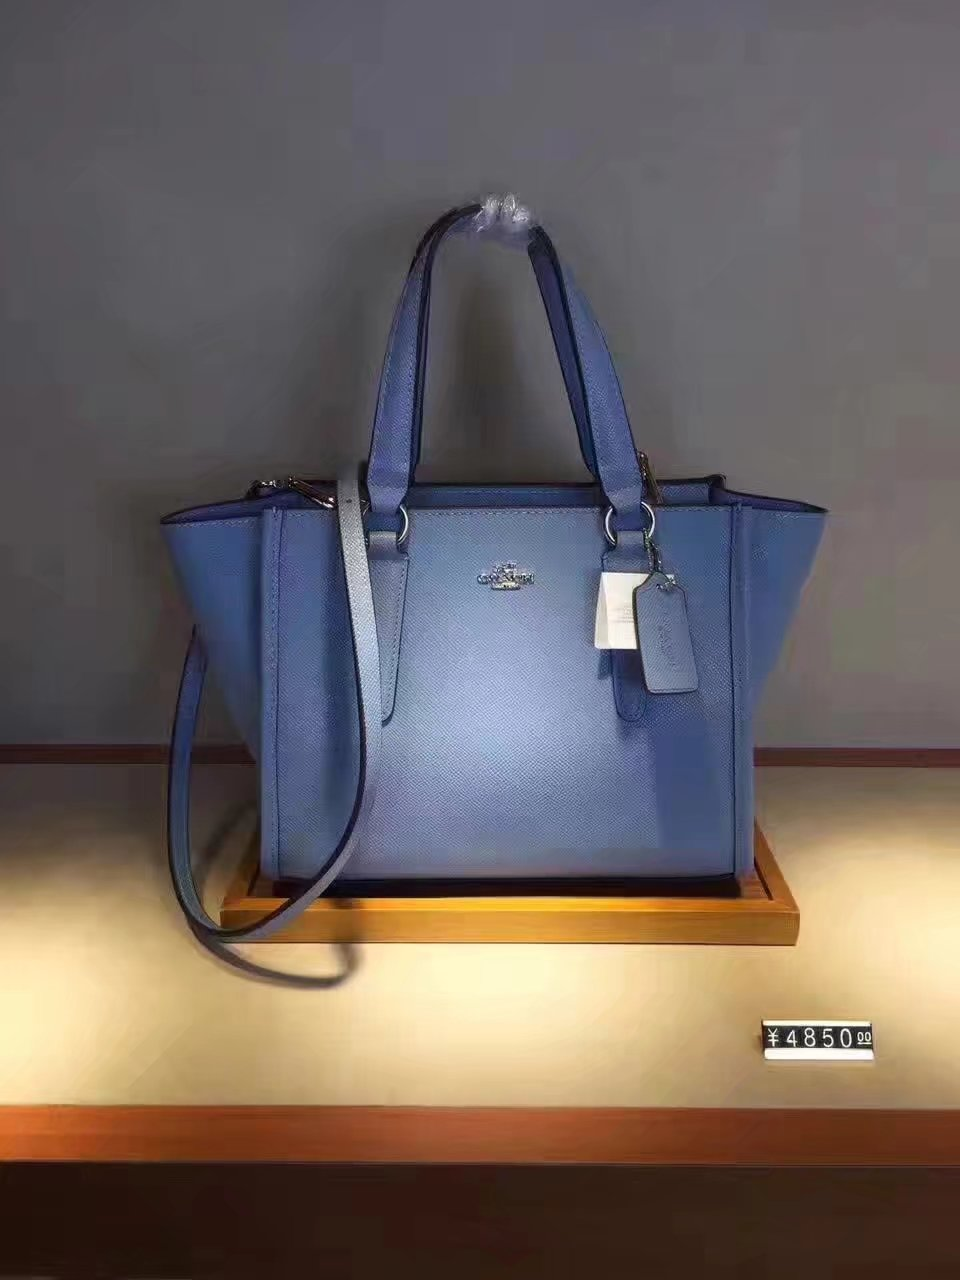 Coach 33537 Brookyln Carryall Tote Bag Light Blue